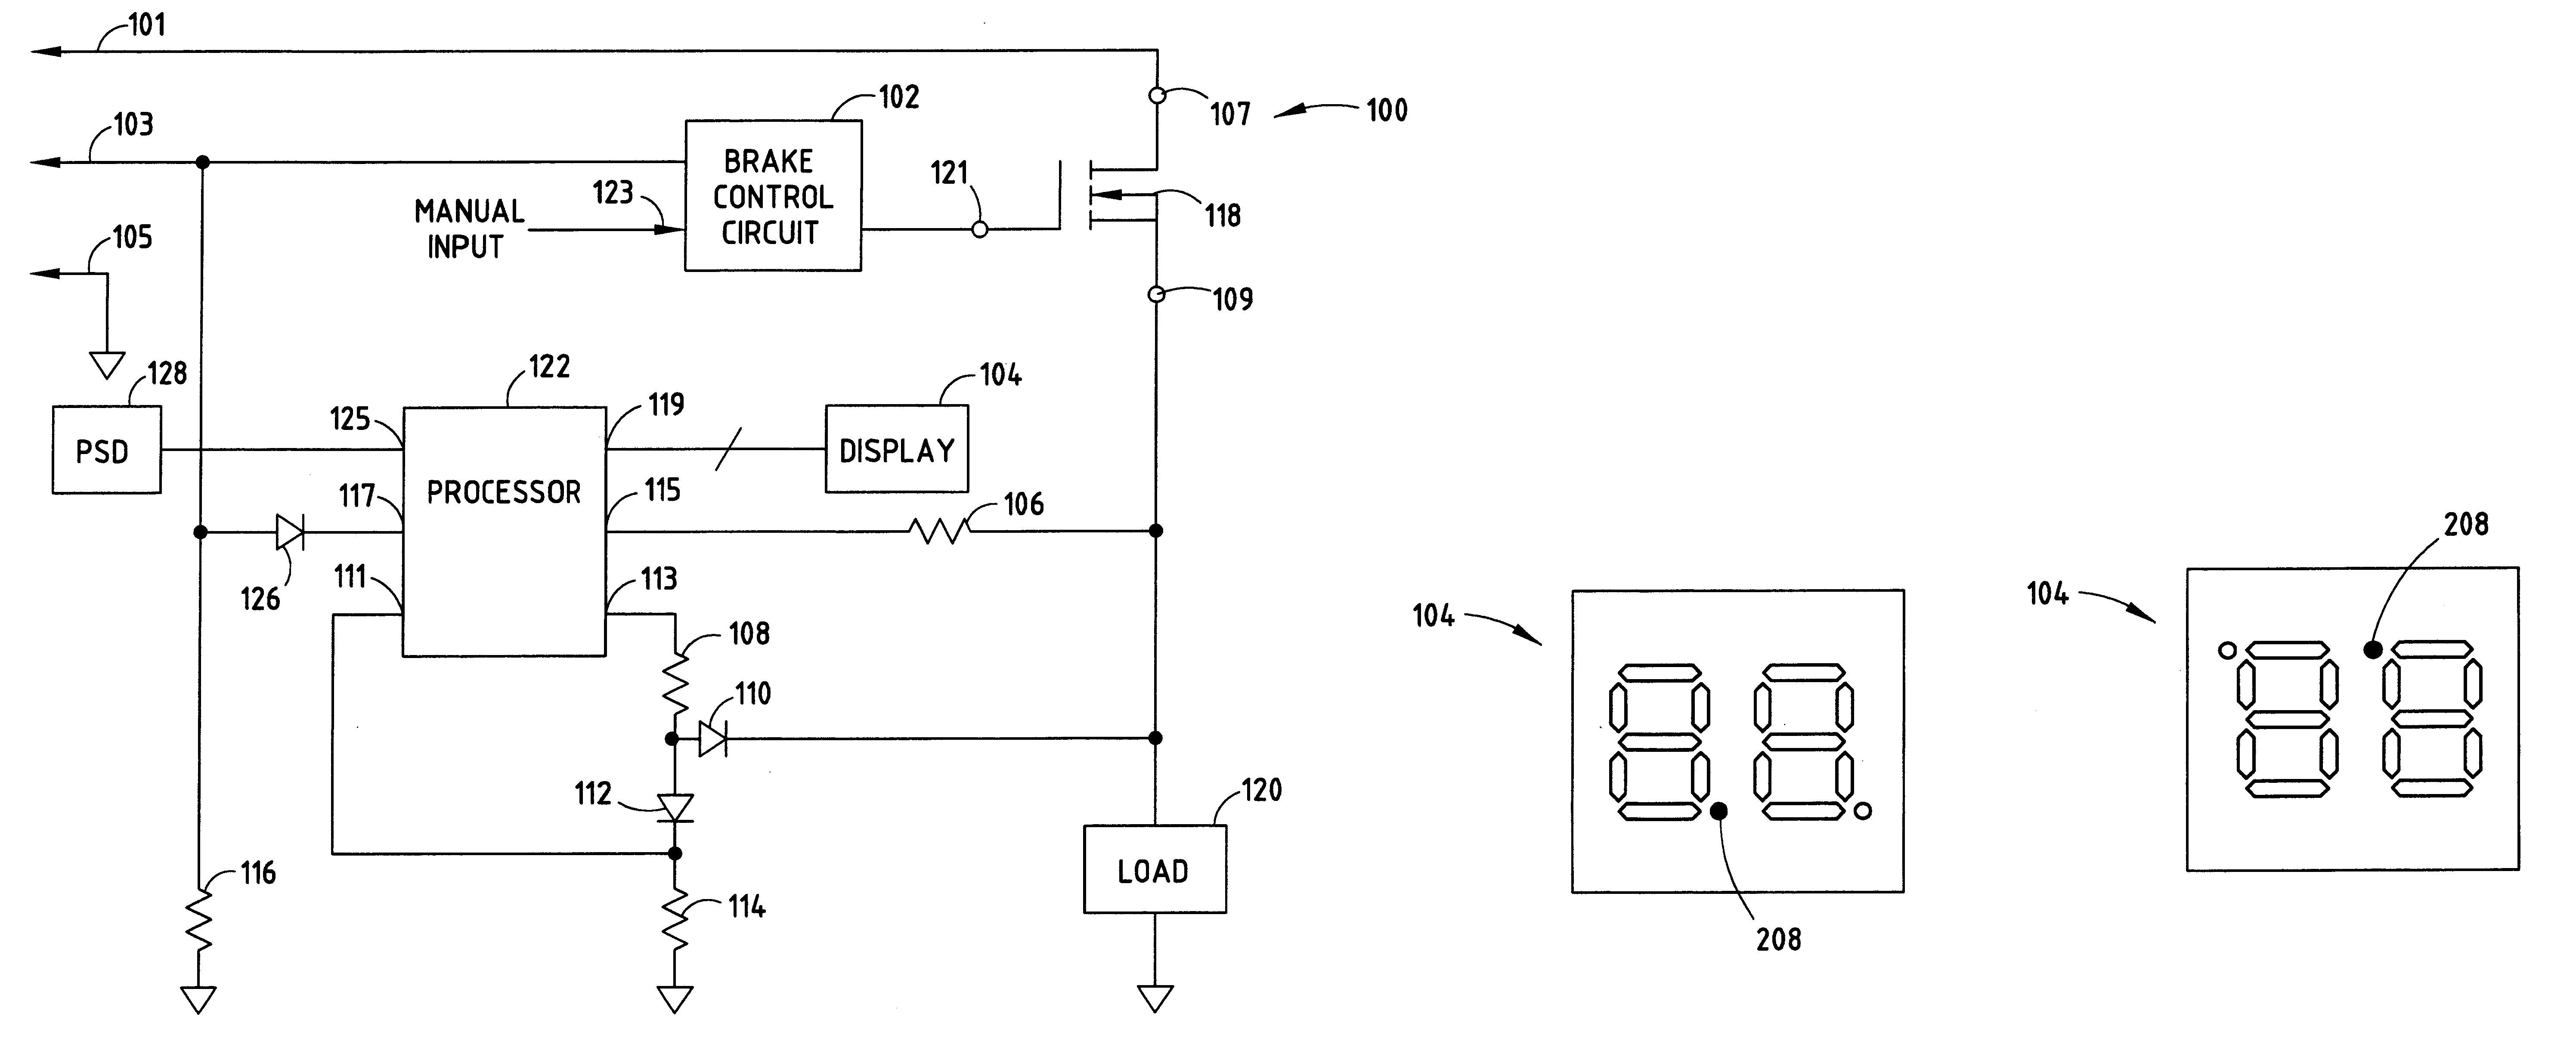 Trailer Breakaway Wiring Diagram Trailer Brake Controller Wiring Diagram Autoctono Of Trailer Breakaway Wiring Diagram